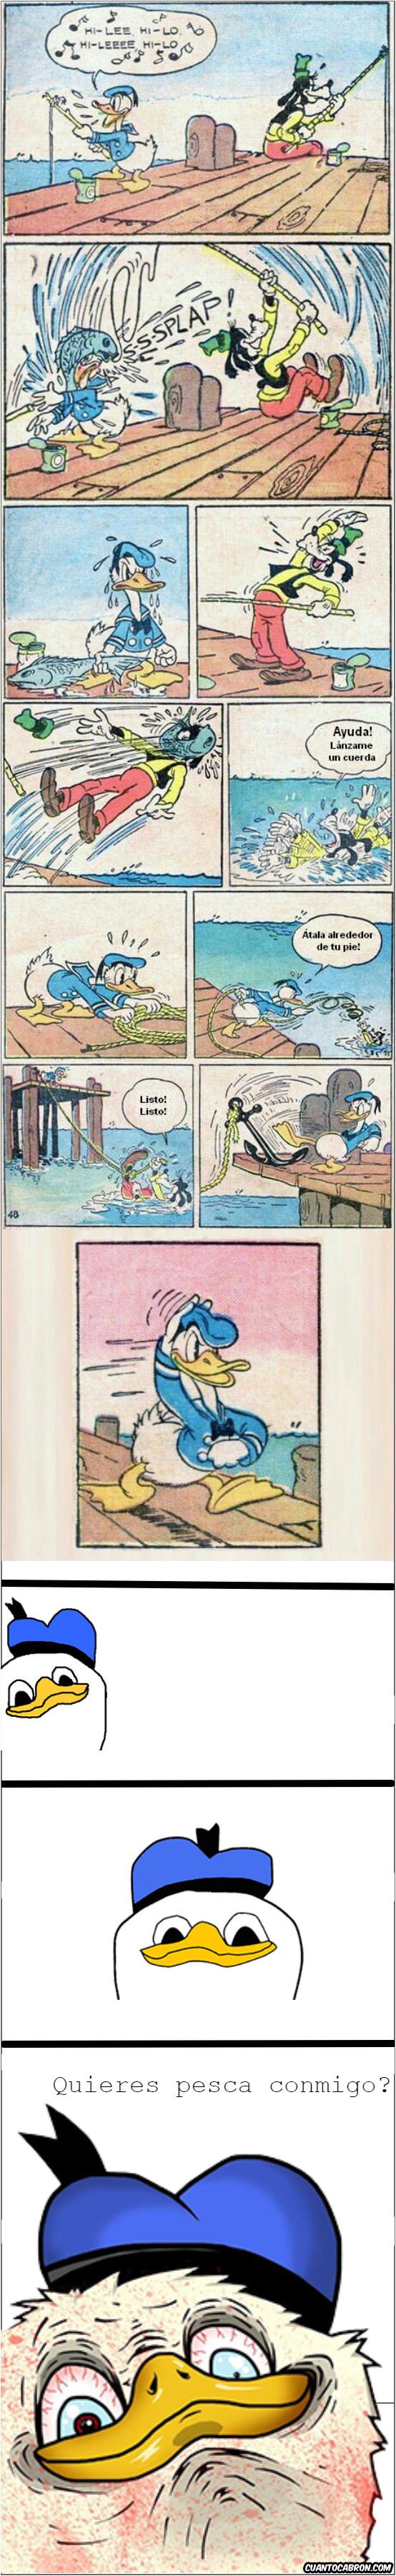 Dolan - Simplemente Dolan